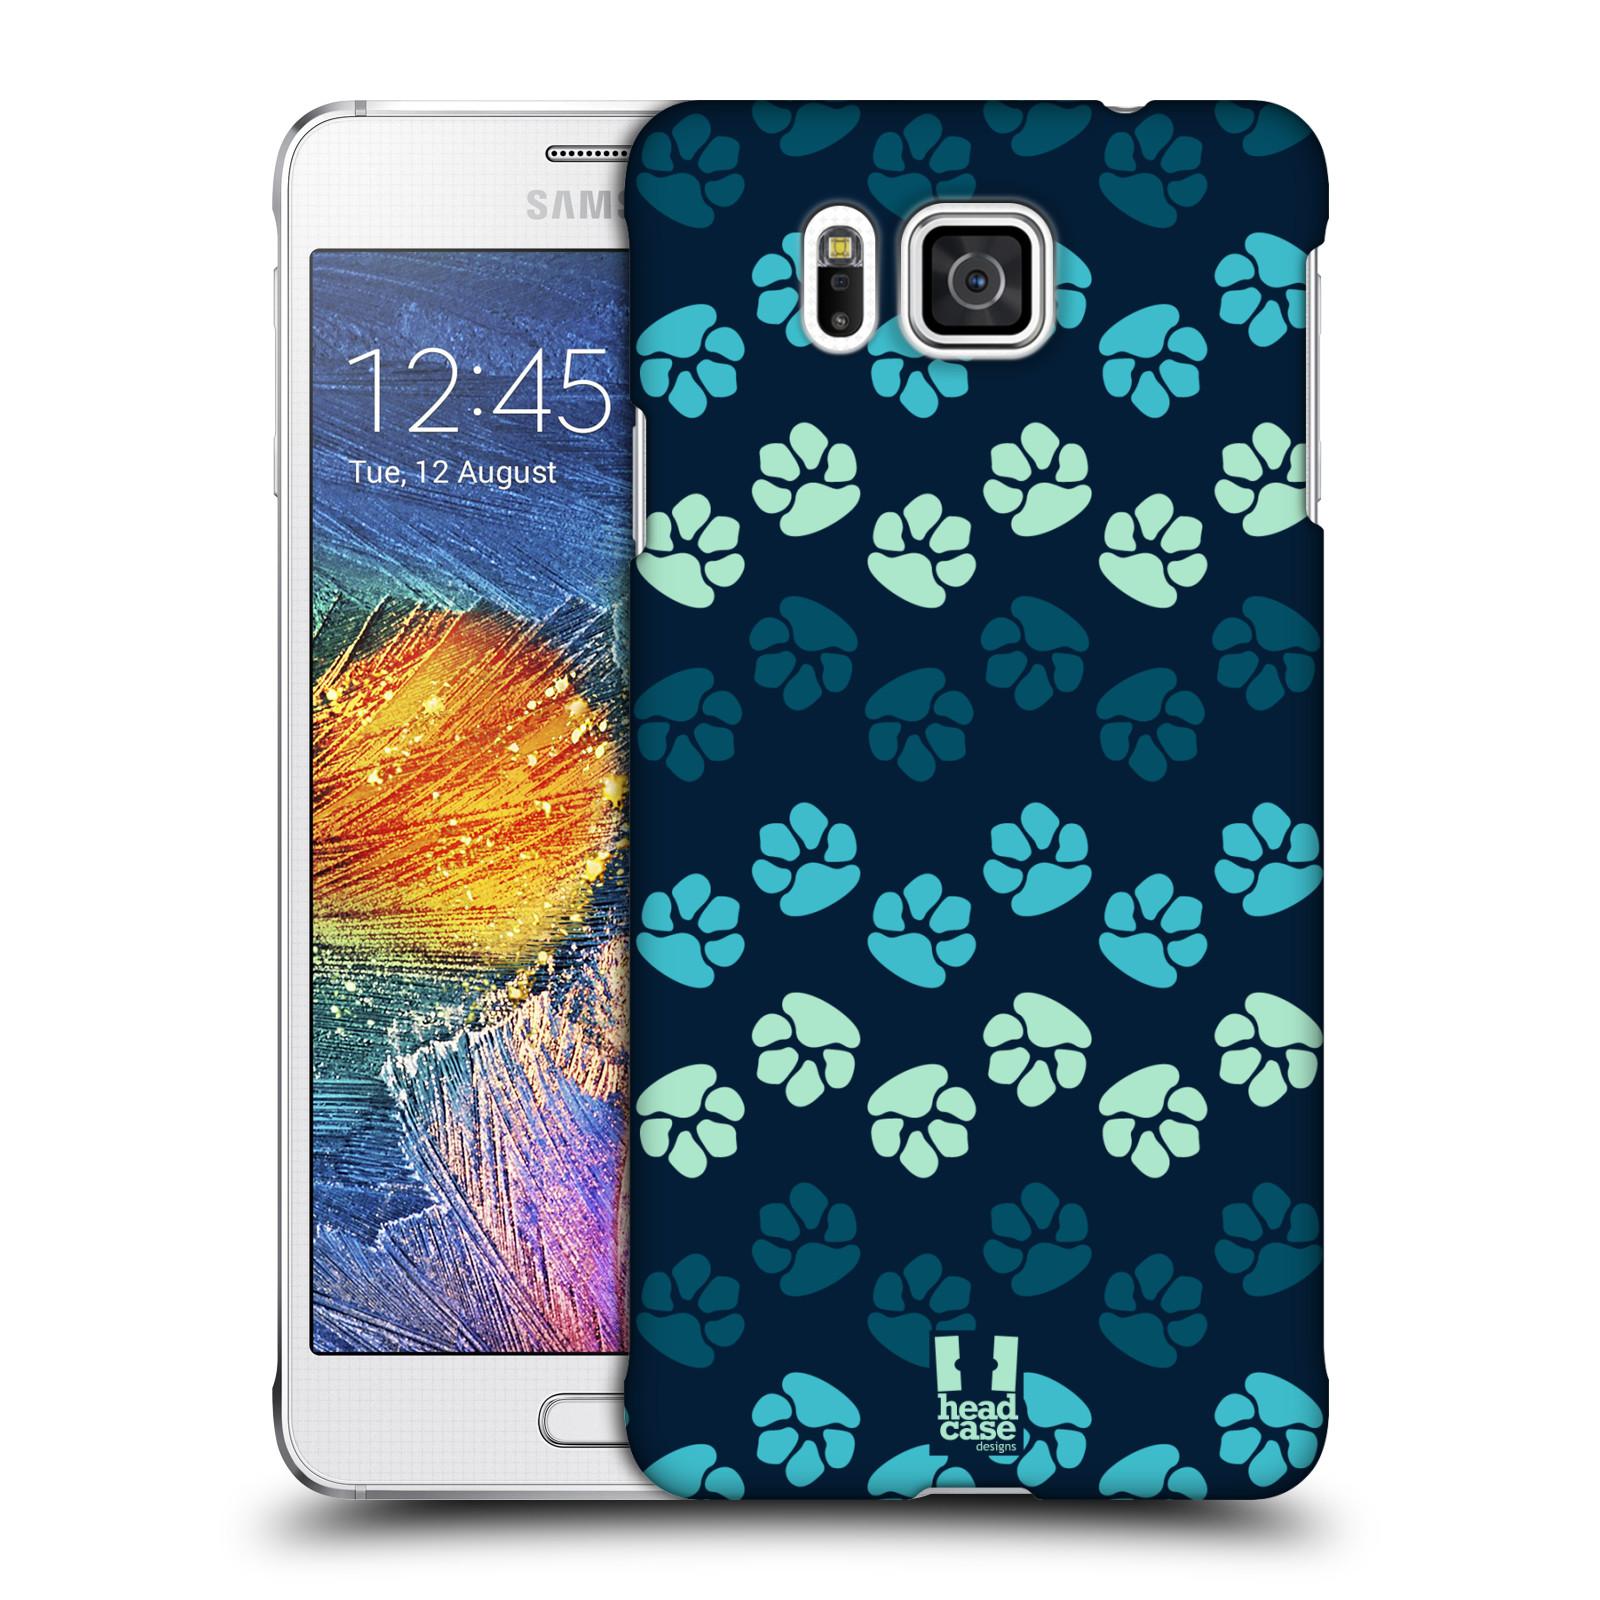 Plastové pouzdro na mobil Samsung Galaxy Alpha HEAD CASE TLAPKY MODRÉ (Kryt či obal na mobilní telefon Samsung Galaxy Alpha SM-G850)